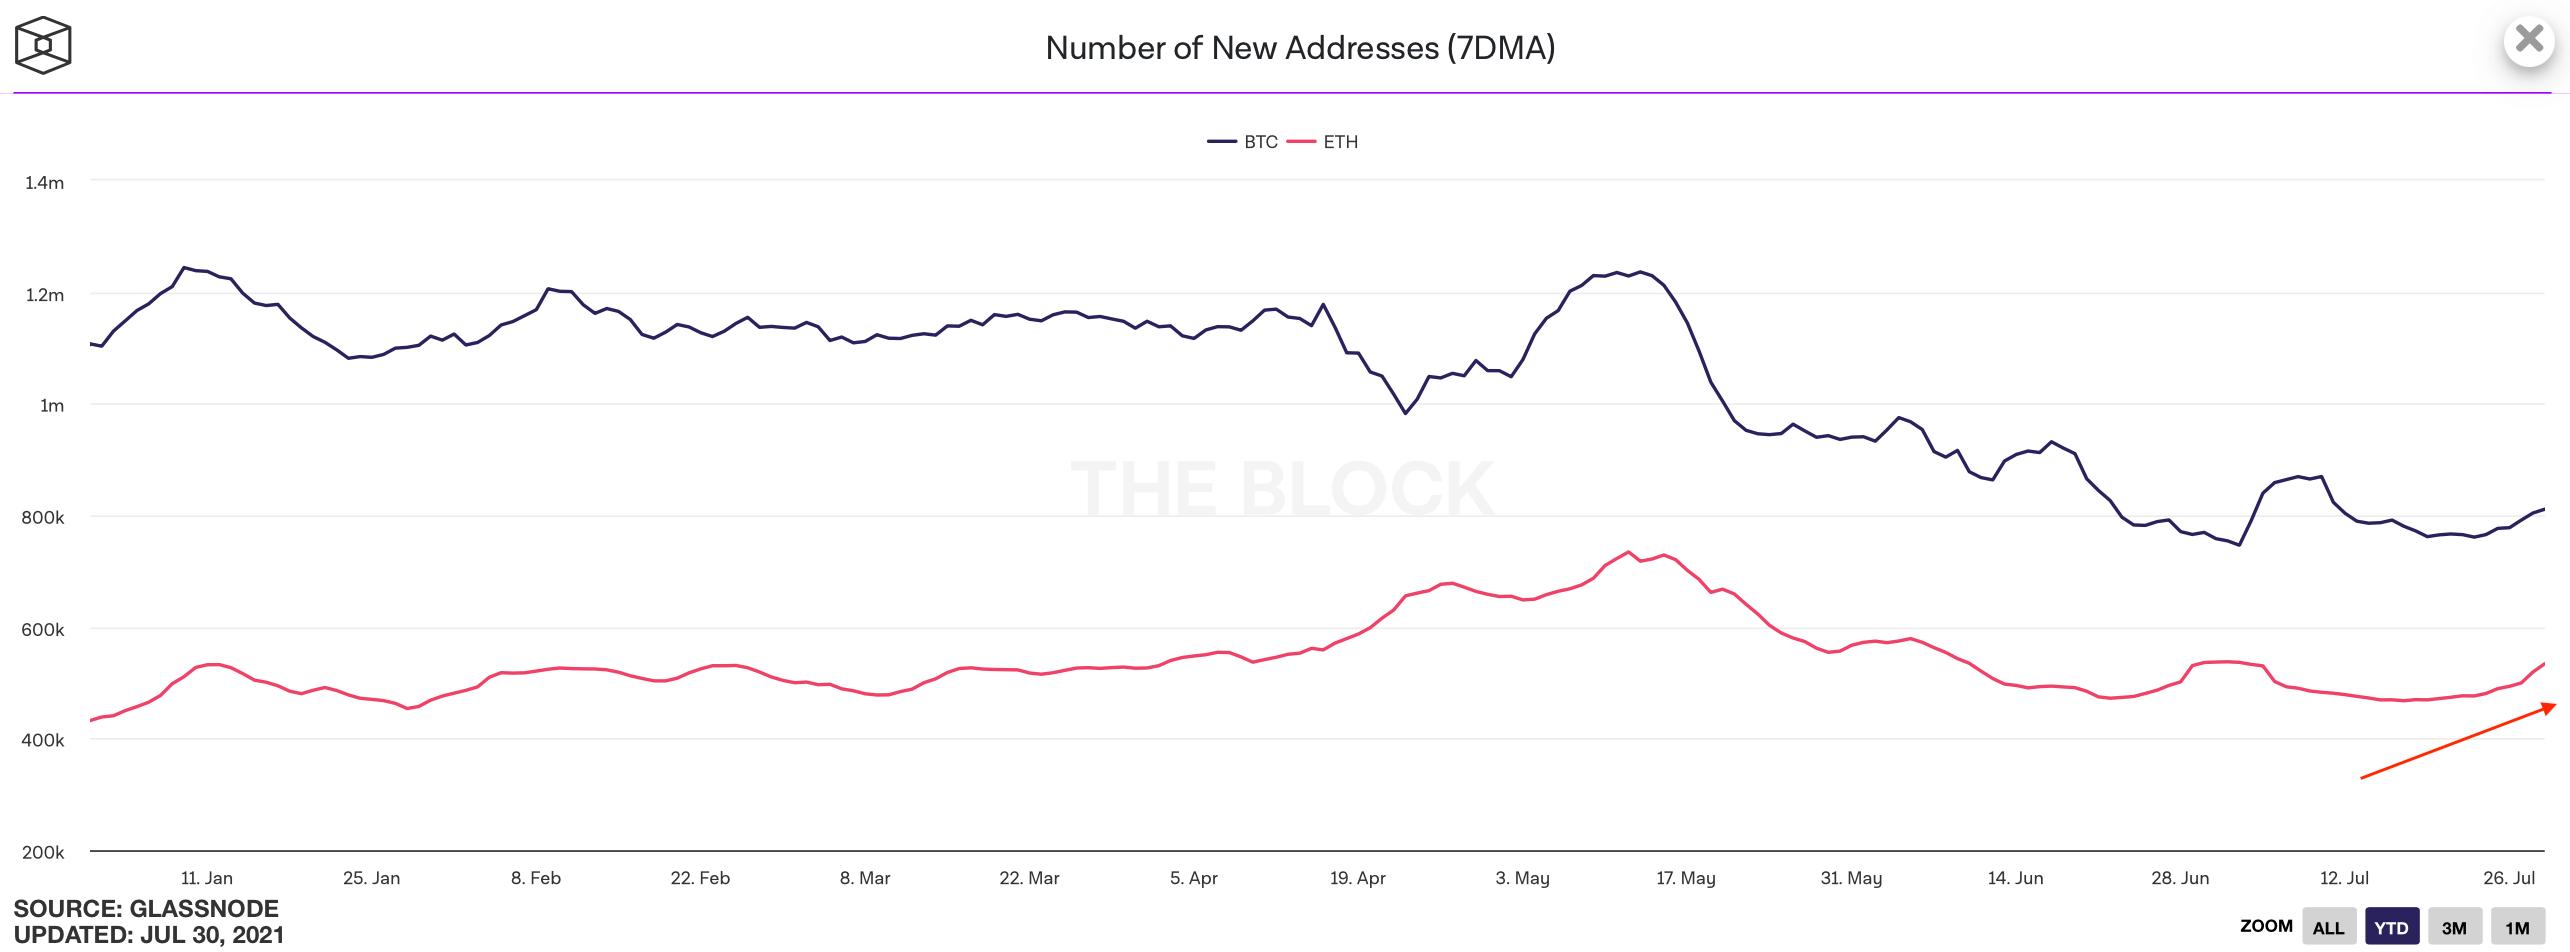 биткоин эфириум адреса график